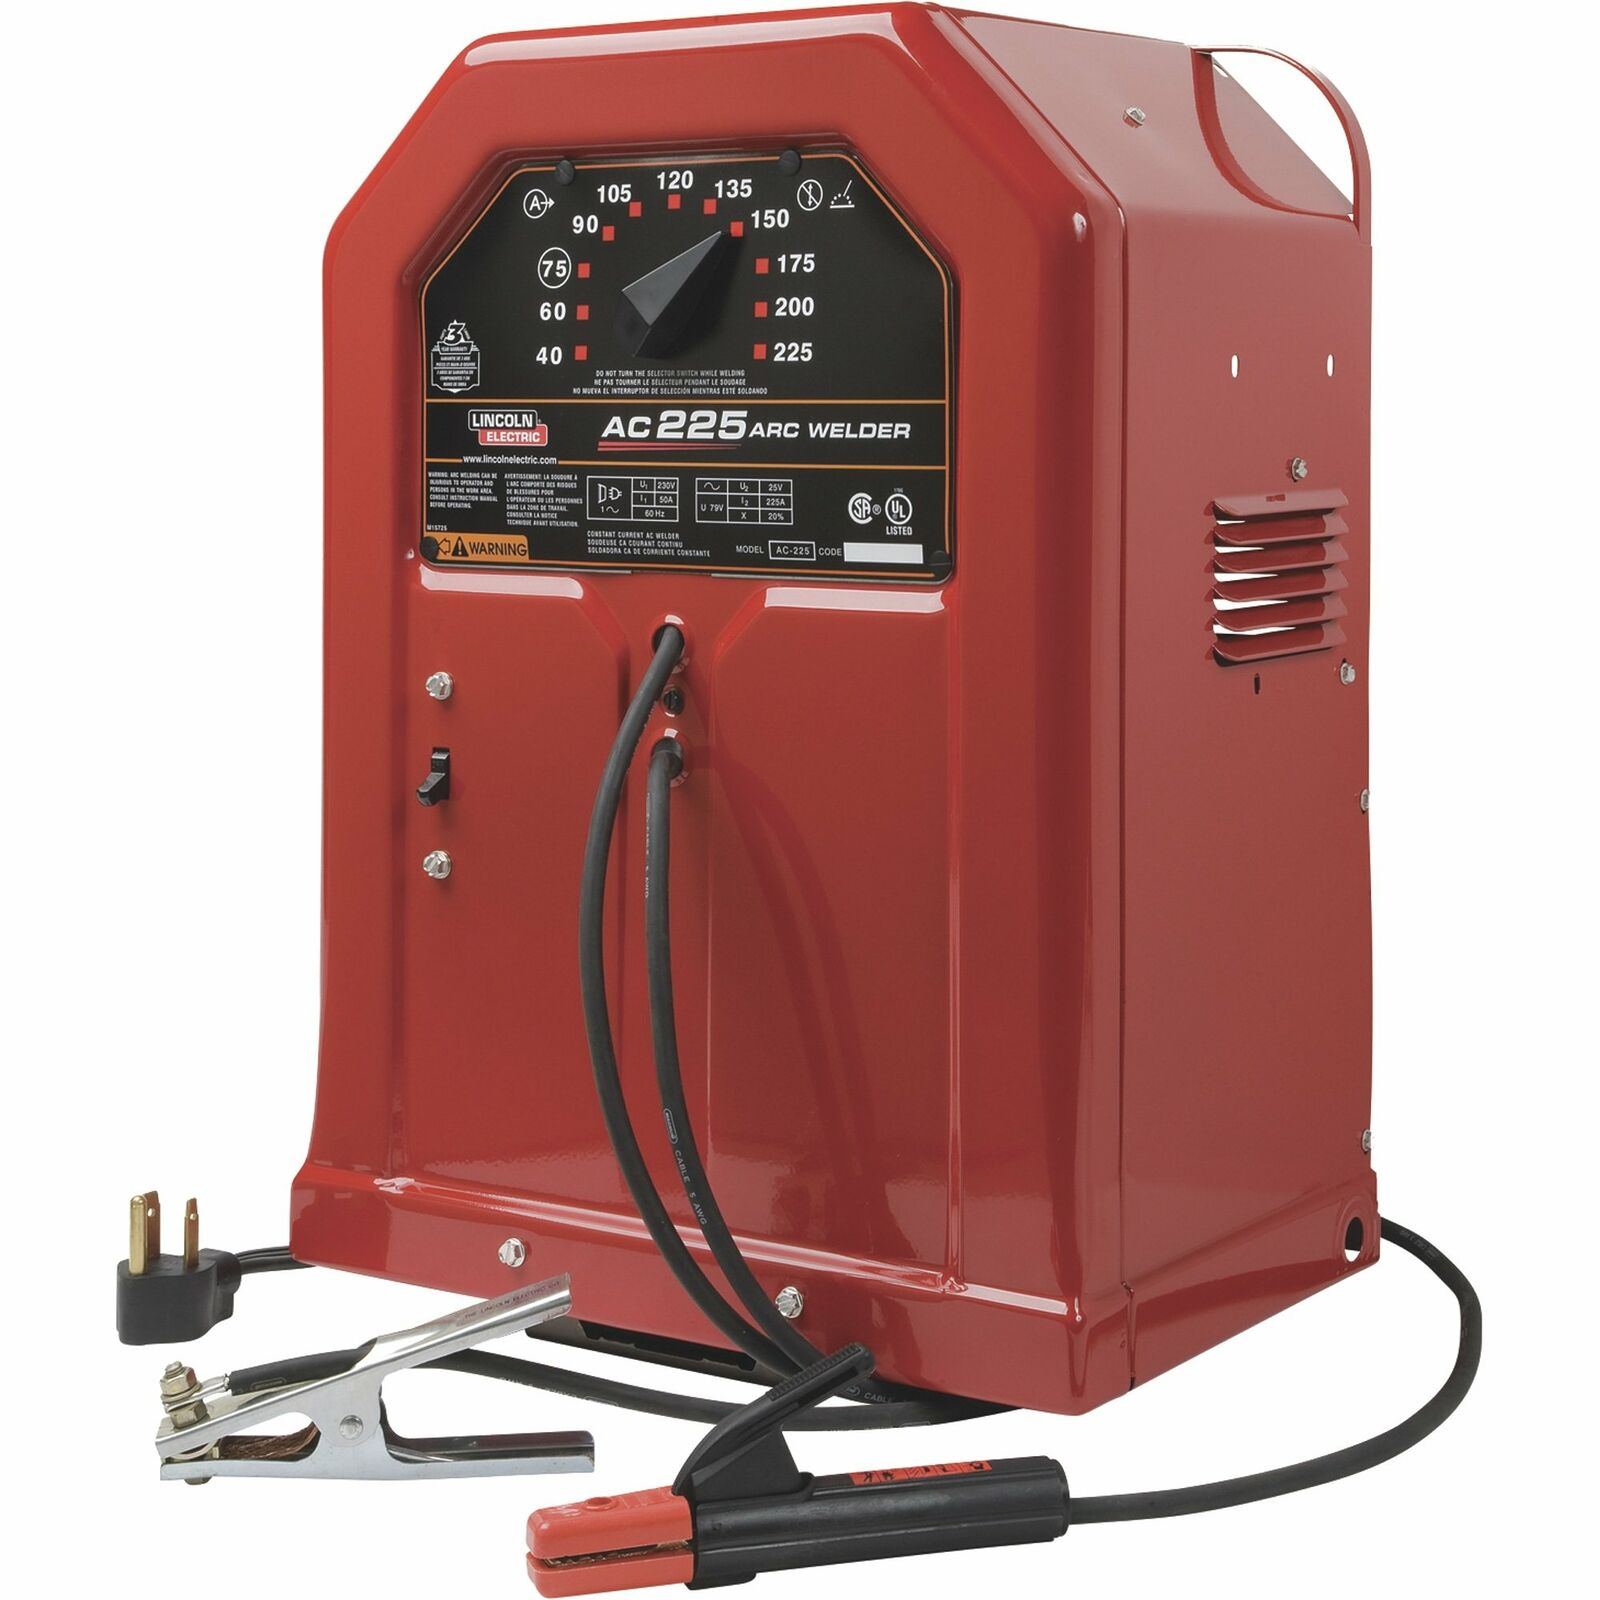 northerntool Lincoln Electric AC-225 AC Arc Welder- Transformer 230V 40-225A Output